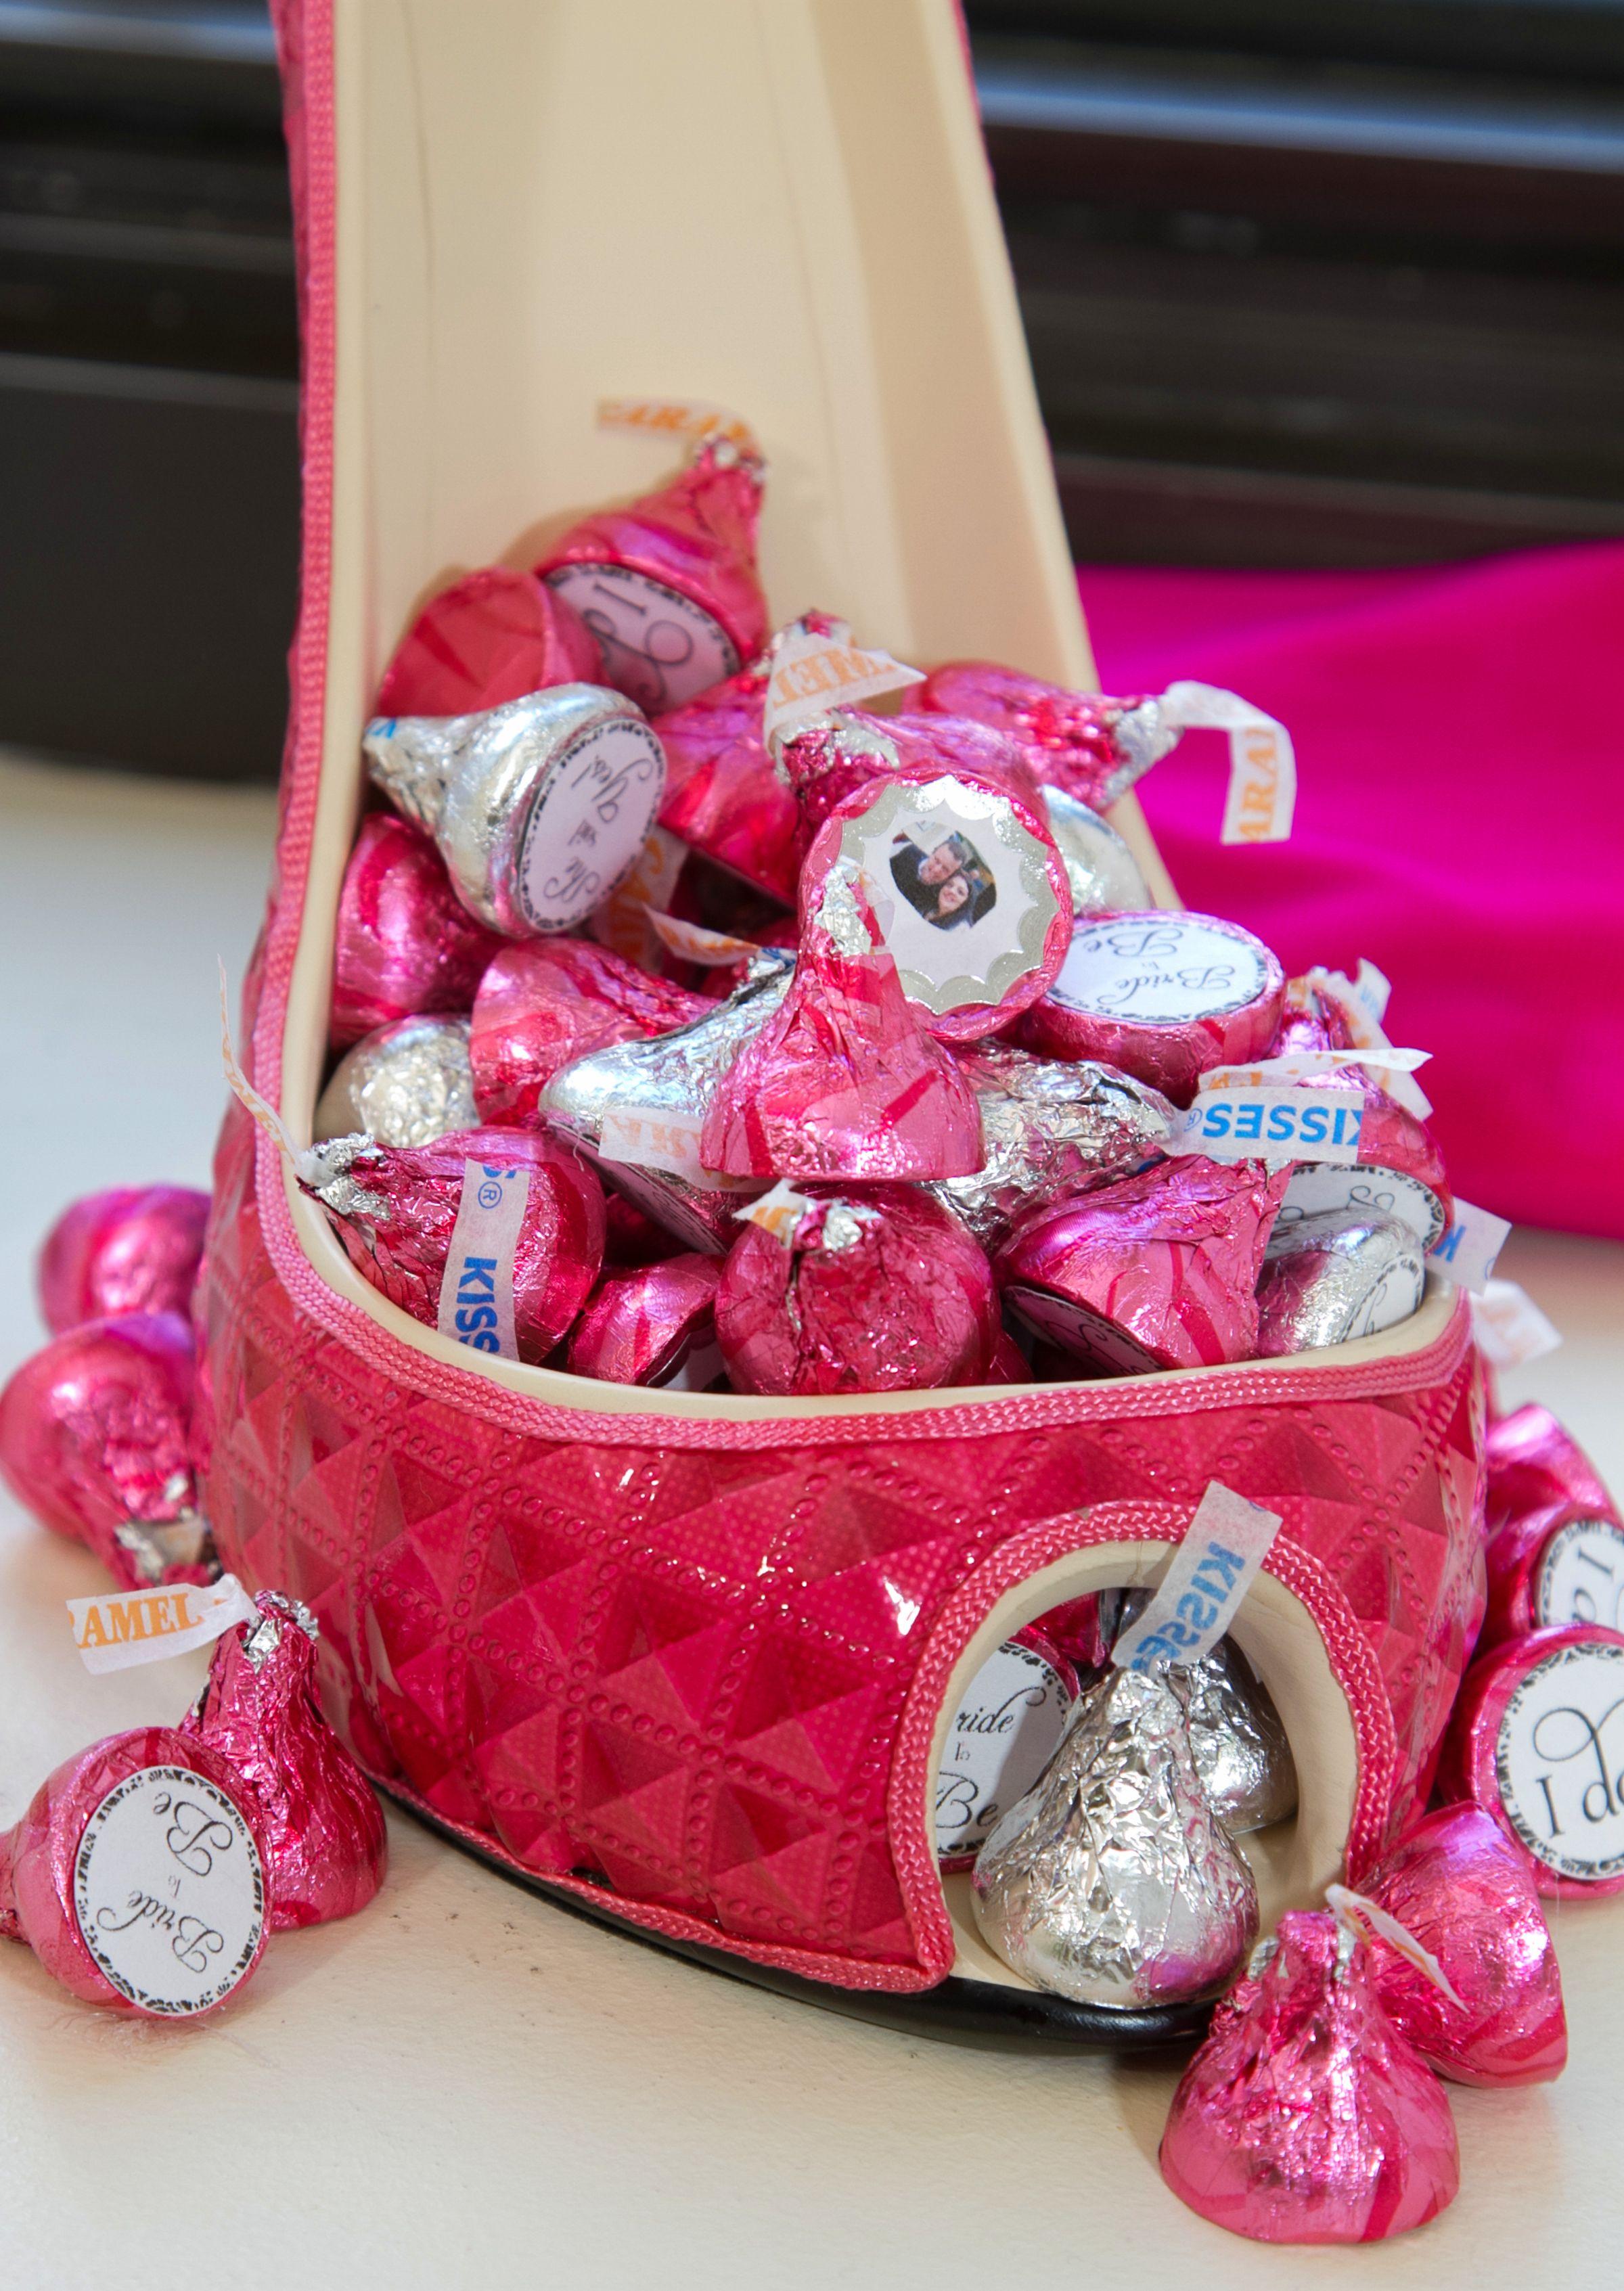 Hershey Kiss filled pink heel #wedding #pink #chocolate | Good ...